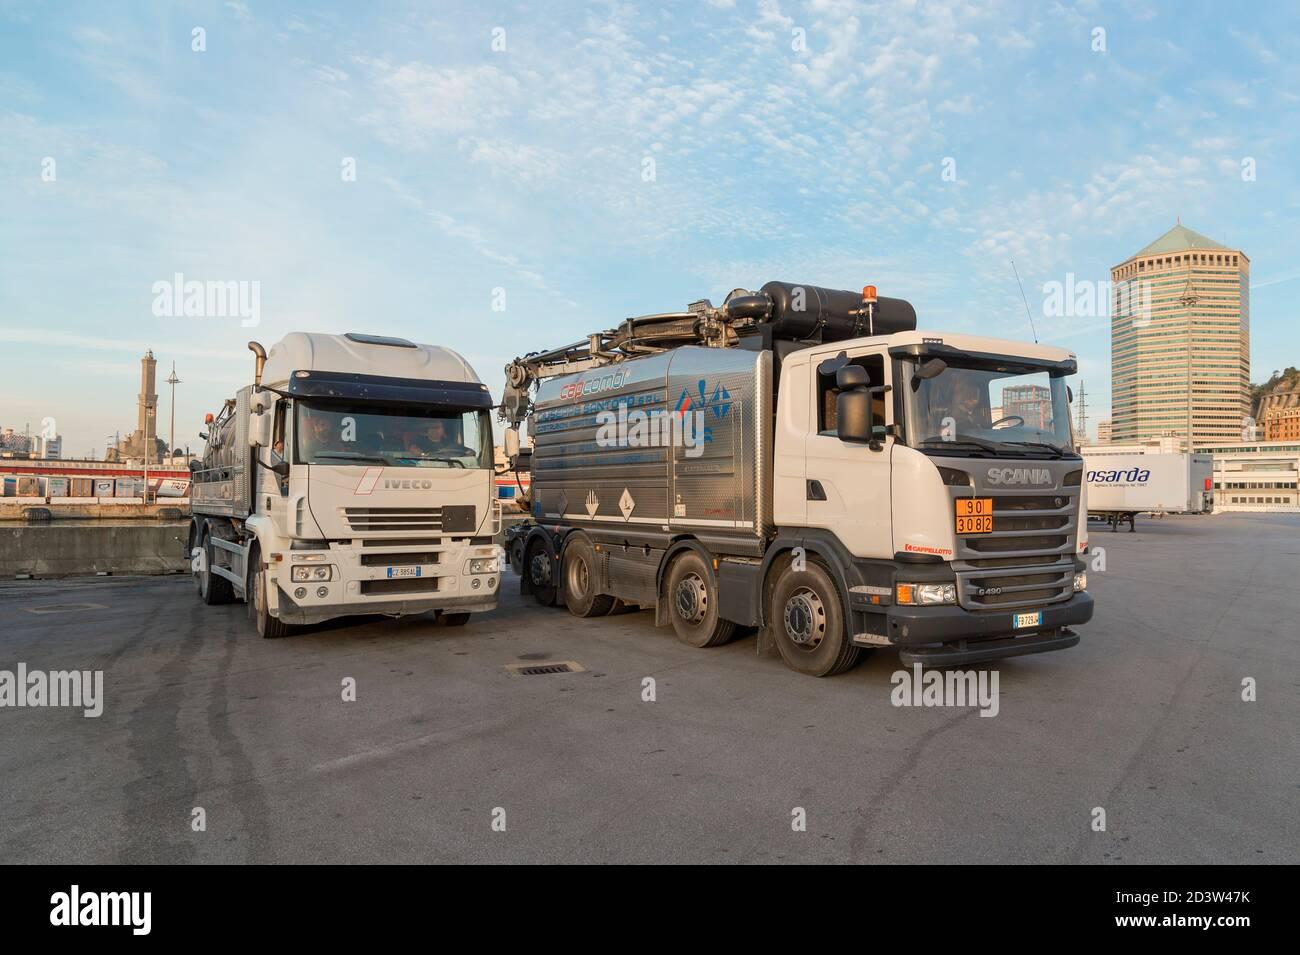 Trucks, Genoa, Liguria, Italy, Europe Stock Photo